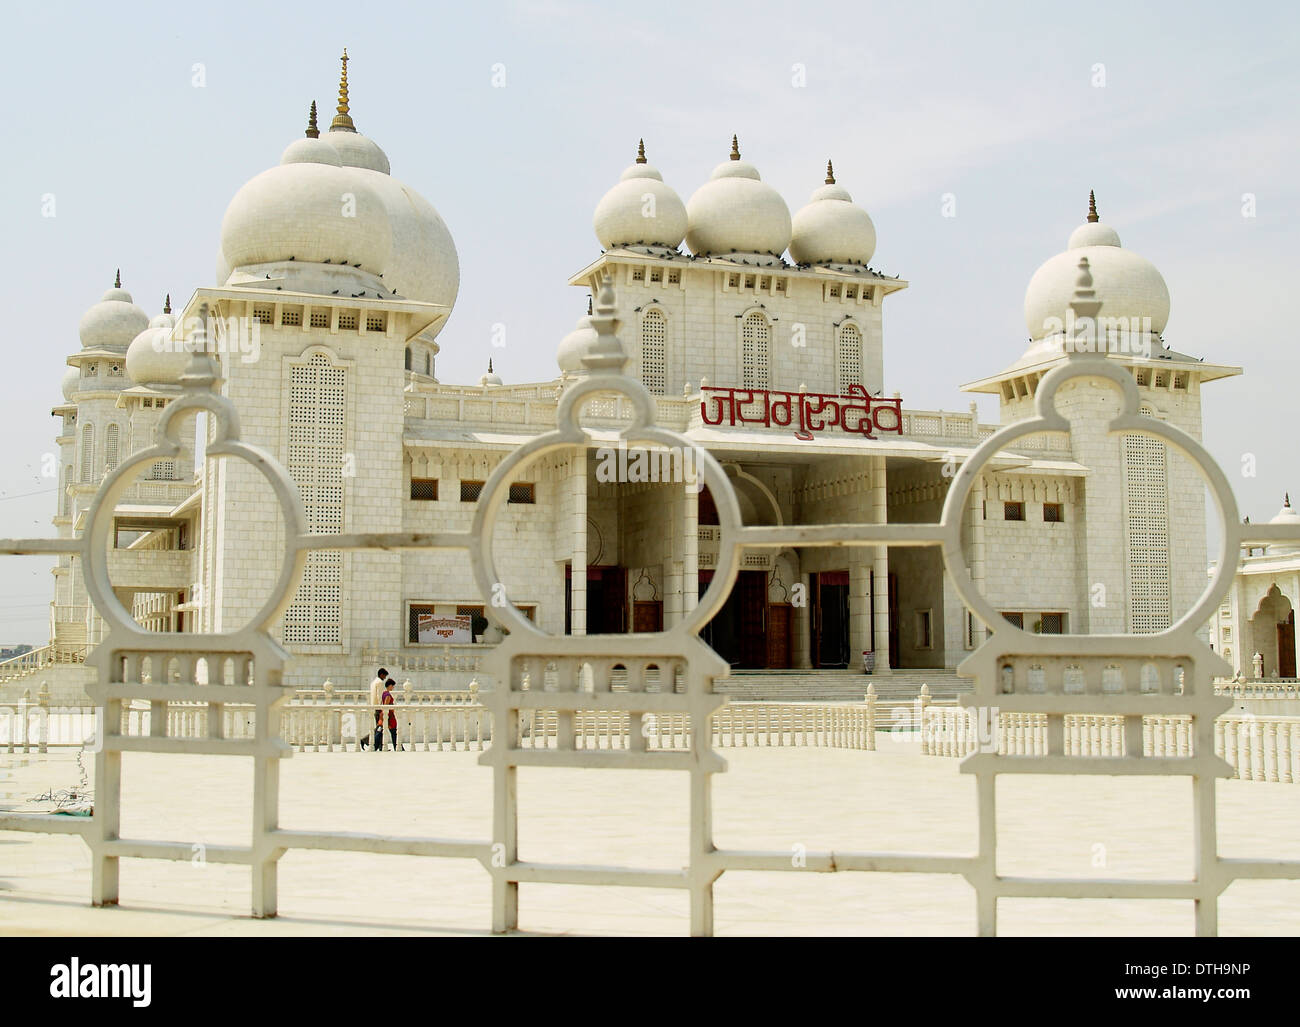 Jai Gurudev Temple,Uttar Pradesh,India - Stock Image